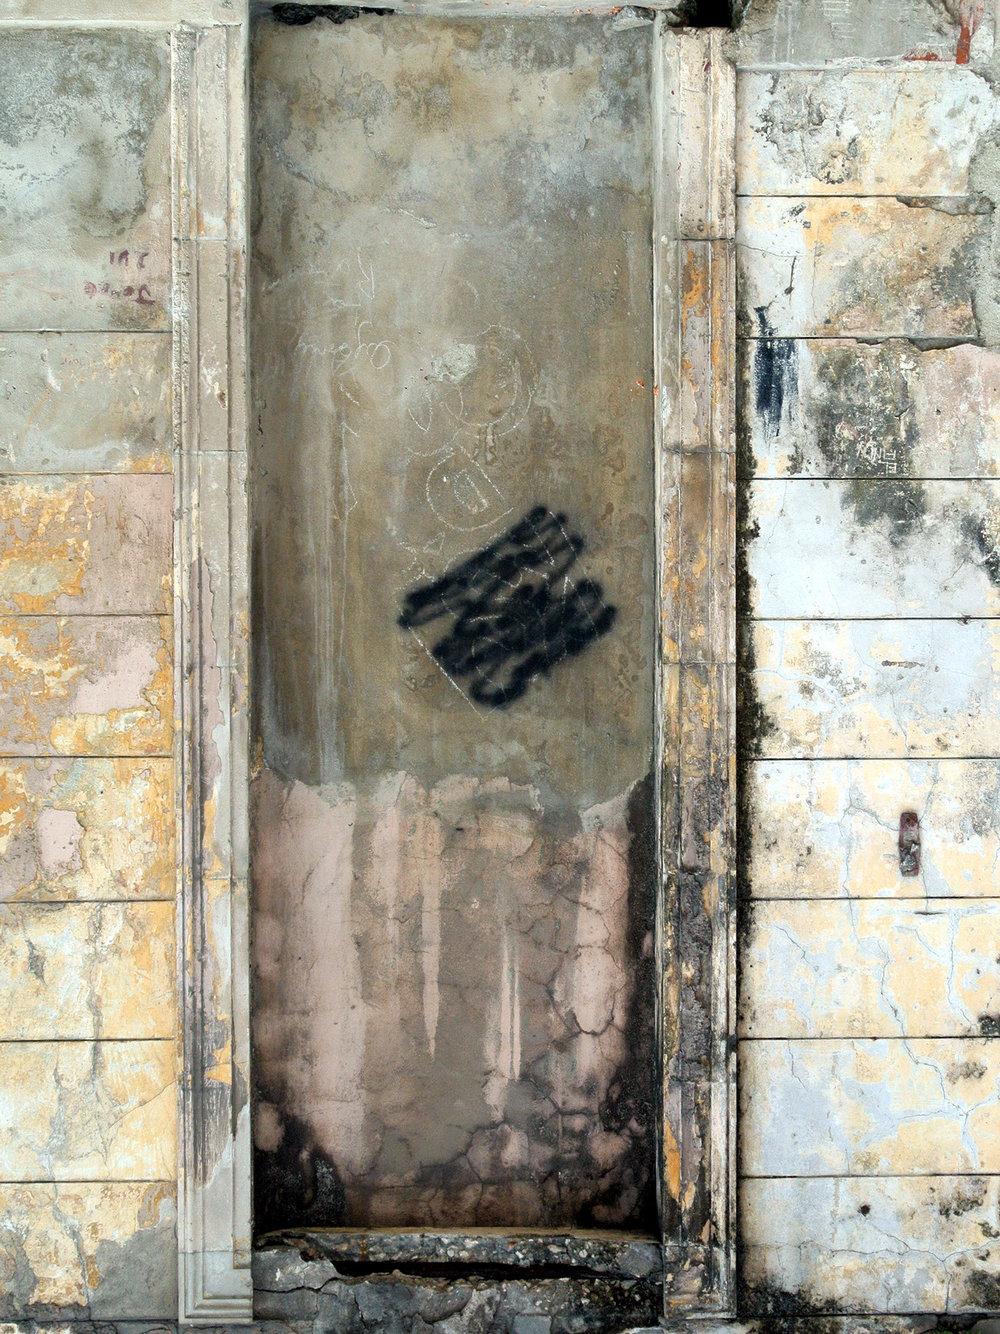 havana-ciudad-viejo-wall-with alcove.jpg